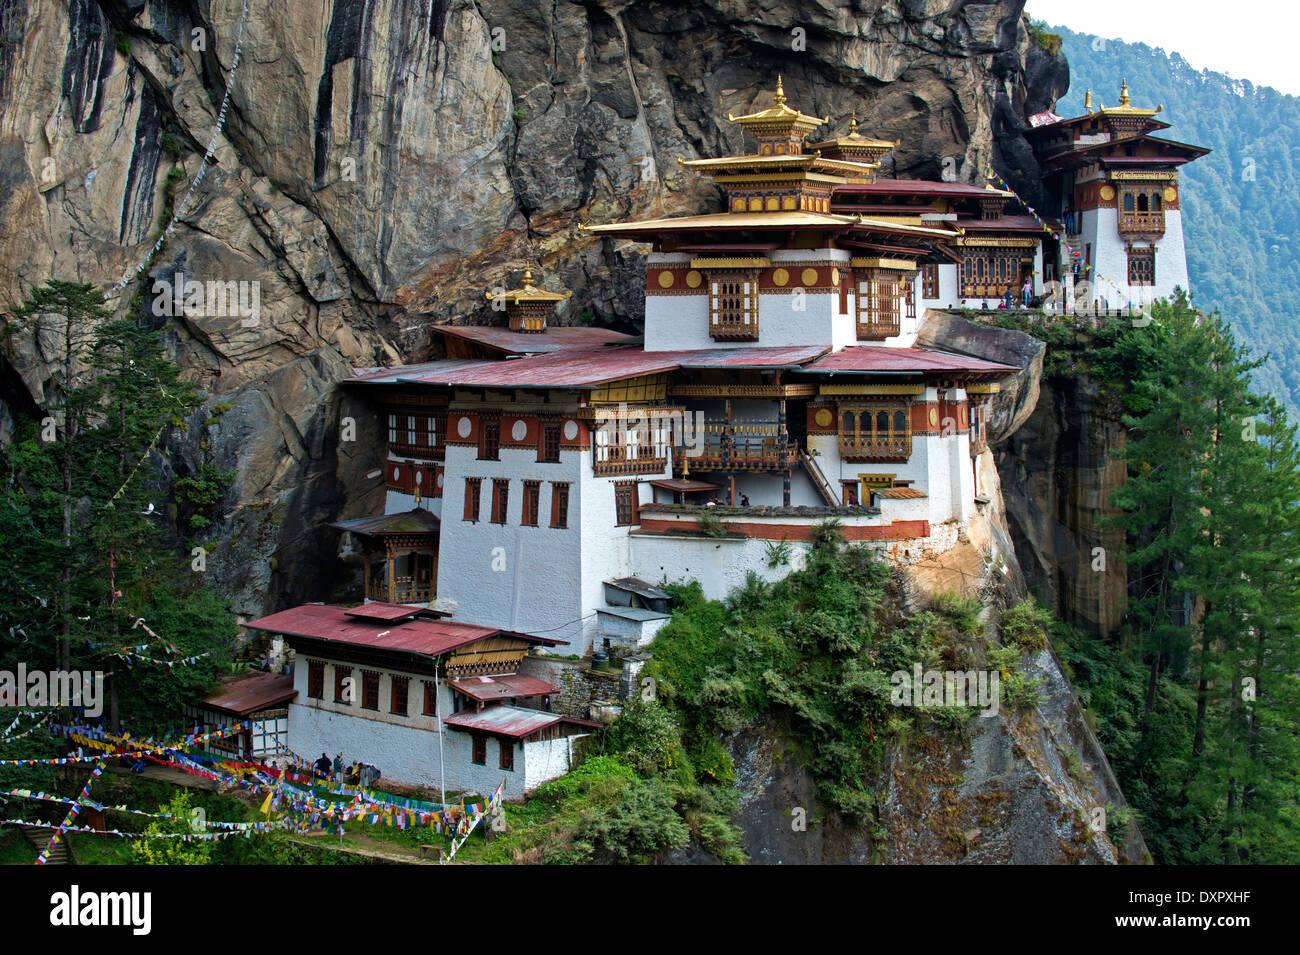 Tiger's Nest Monastery, Taktsang Palphug Monastery, Paro, Bhutan - Stock Image